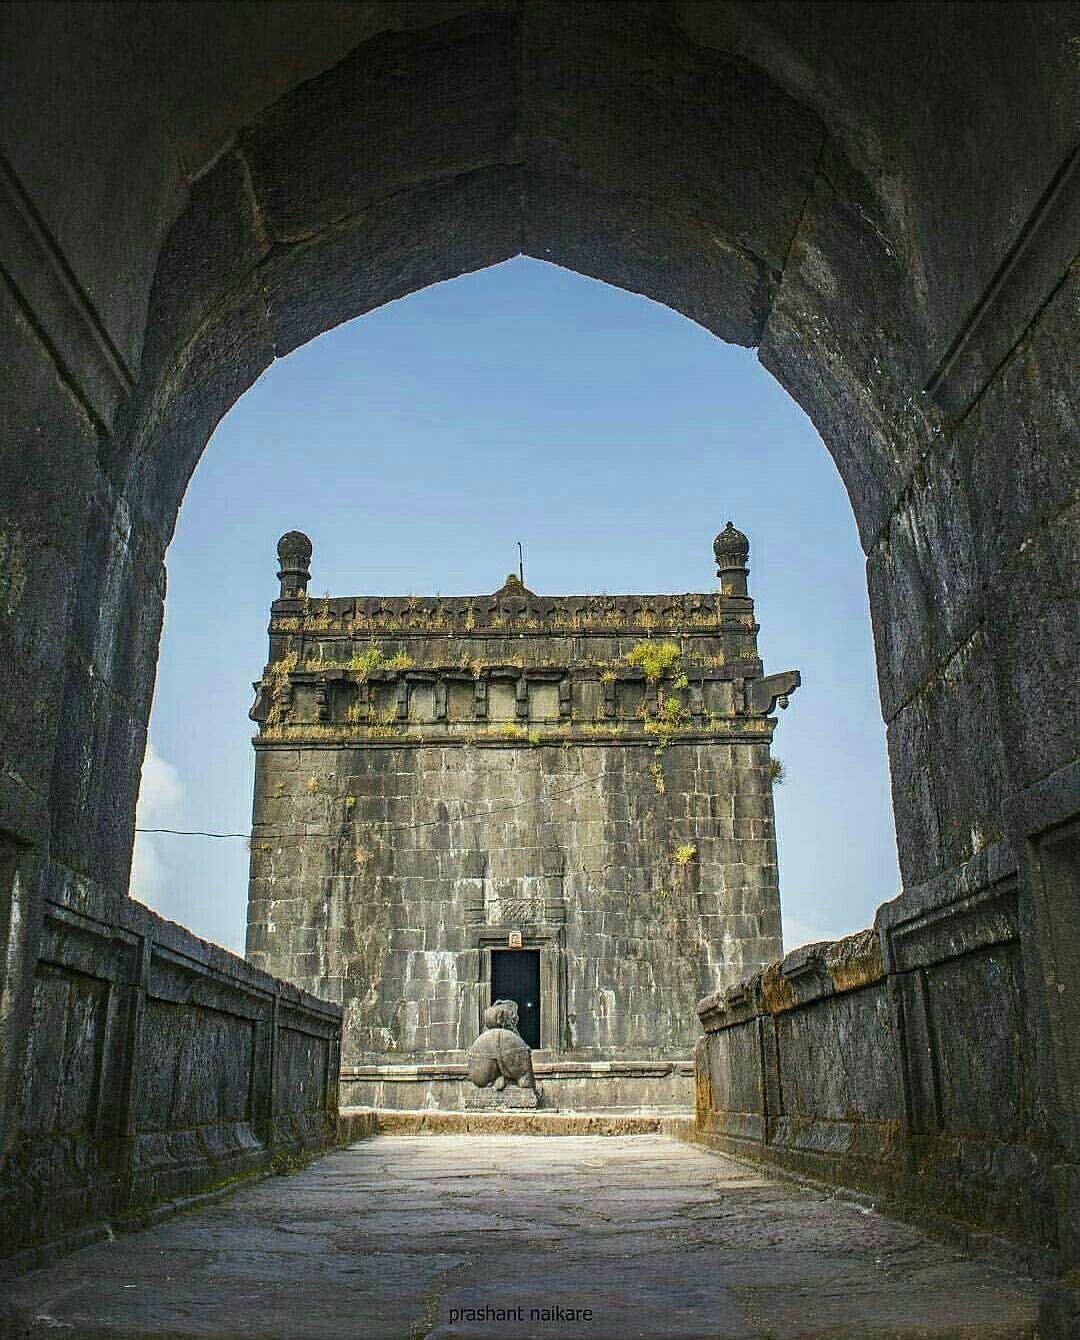 300+ Chhatrapati Shivaji Maharaj HD Images (2020) Pics of Veer शिवाजी महाराज फोटो डाउनलोड | Good Morning Images 2020